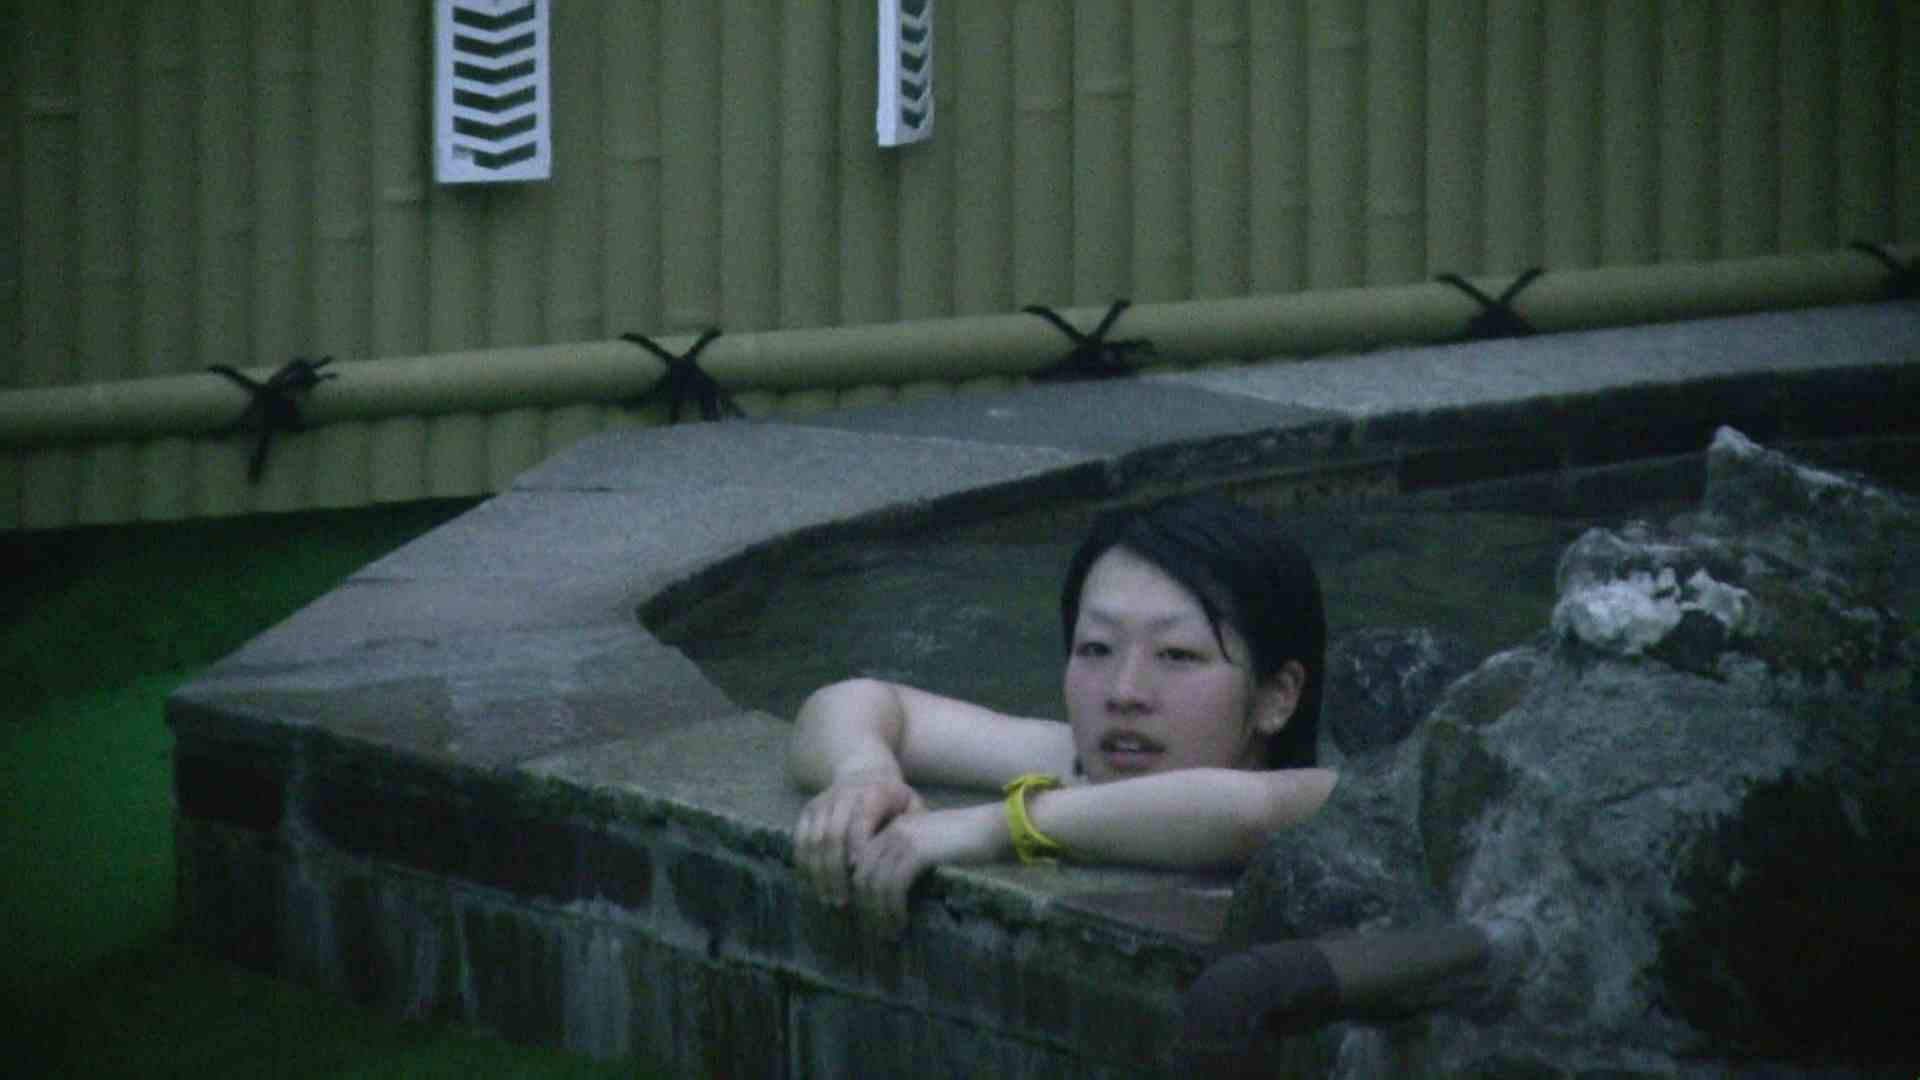 Aquaな露天風呂Vol.05【VIP】 露天風呂編 | 盗撮シリーズ  112PIX 87